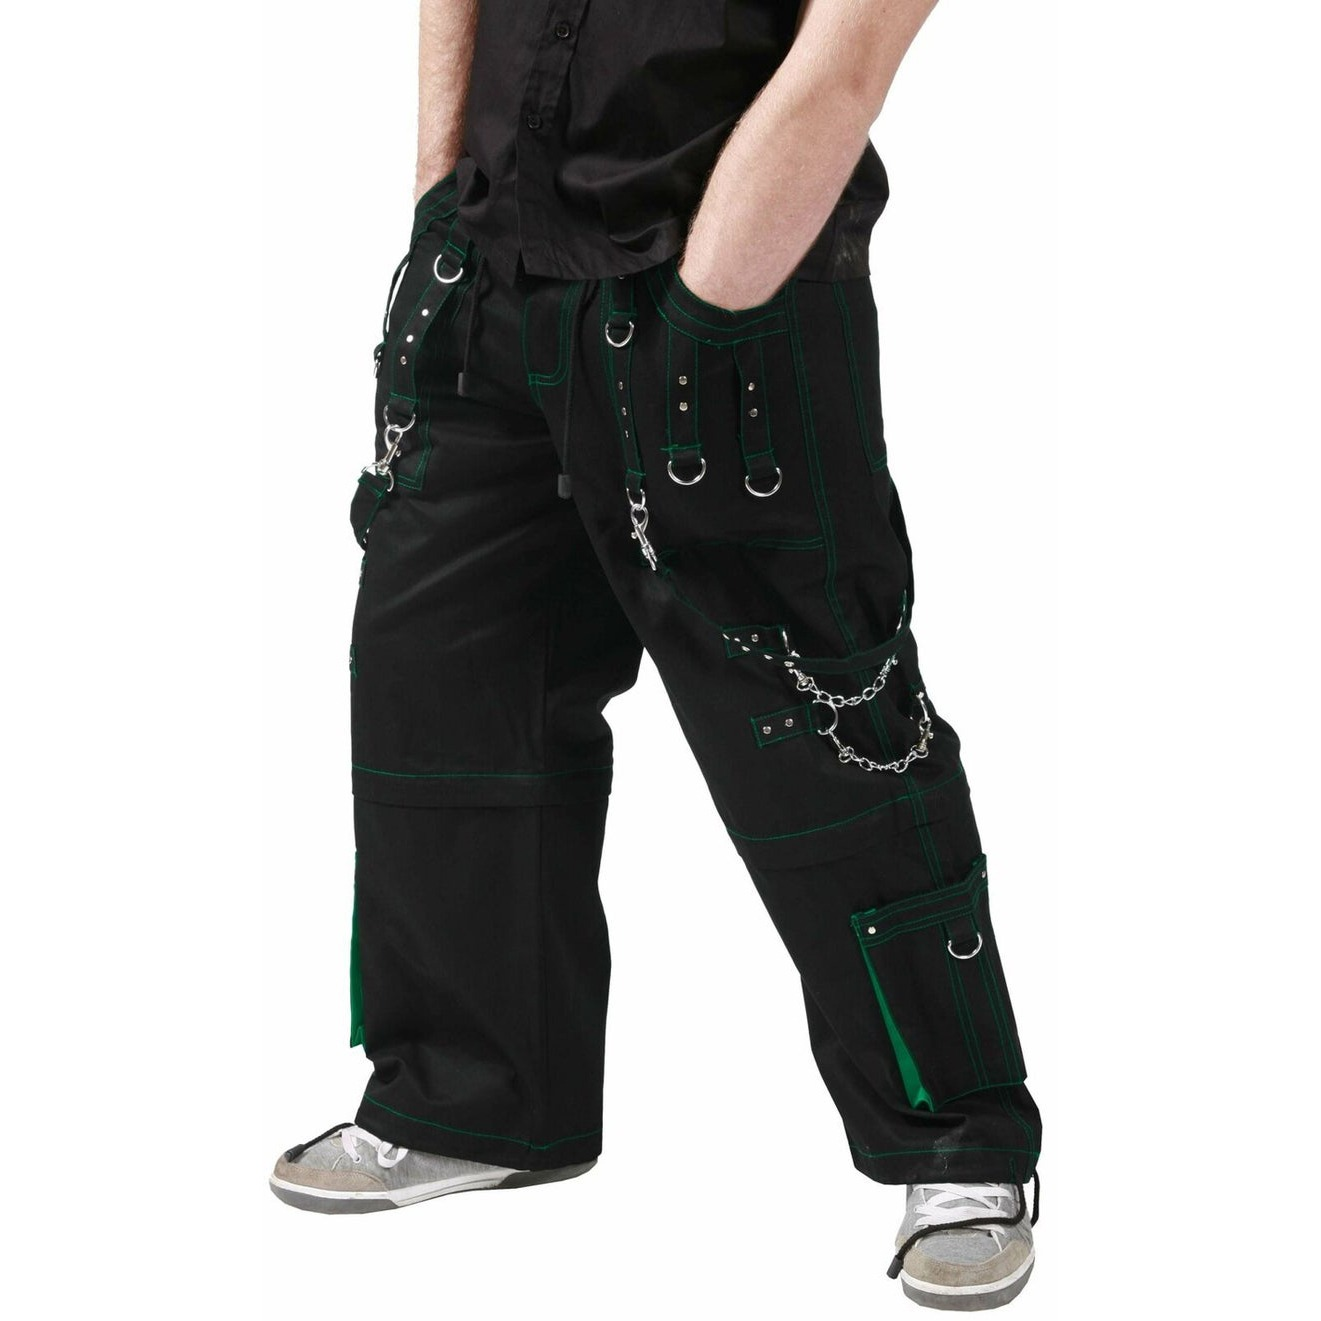 Gothic Men,s handmade Dead Thread Bondage 4 pocket Trouser Punk Rock Black WITH GREEN stitch